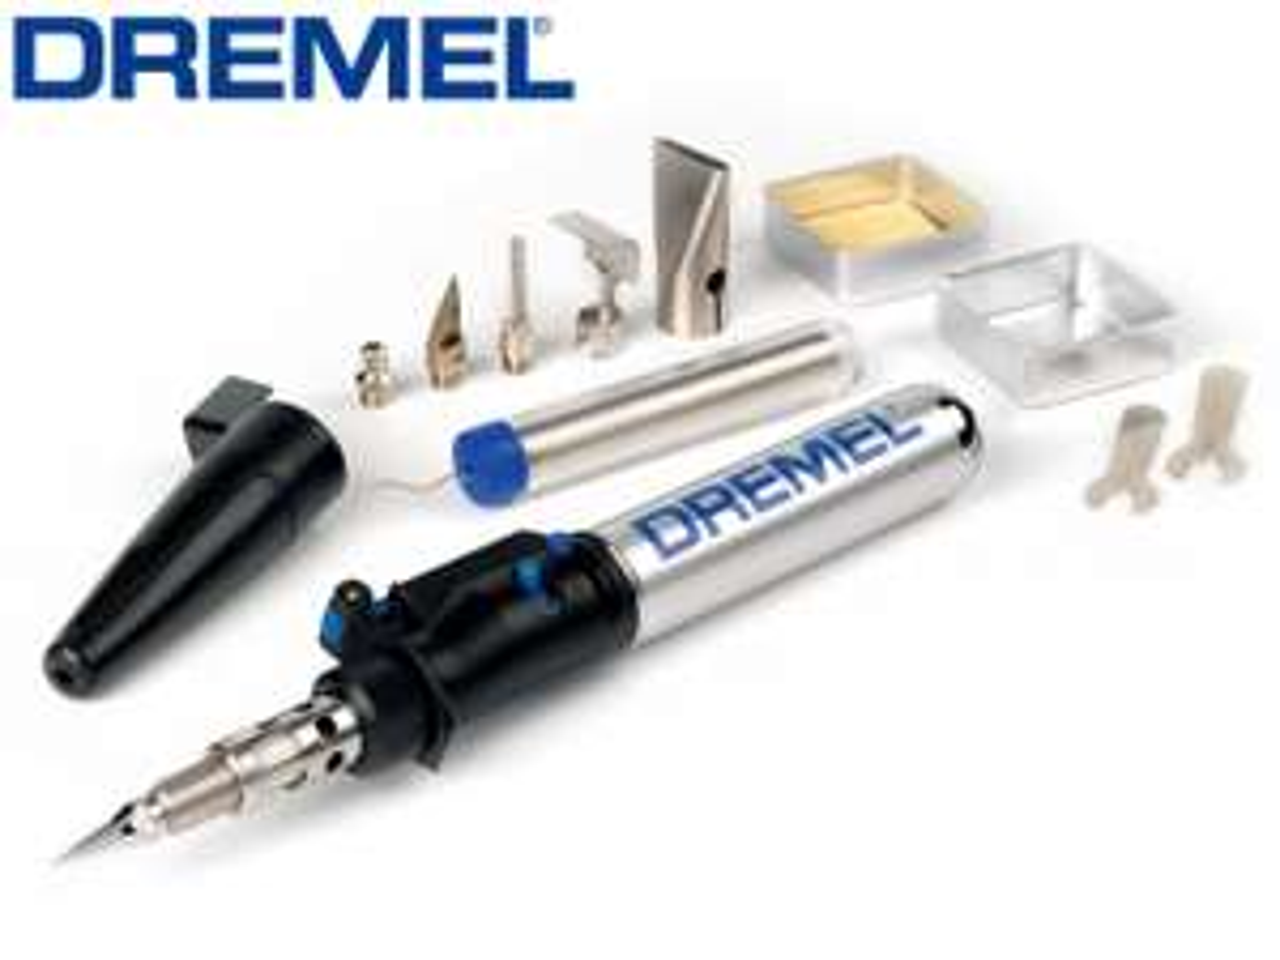 Dremel Versatip Cordless 6 in 1 Soldering Iron £23.75 @ Homebase (Free C&C)